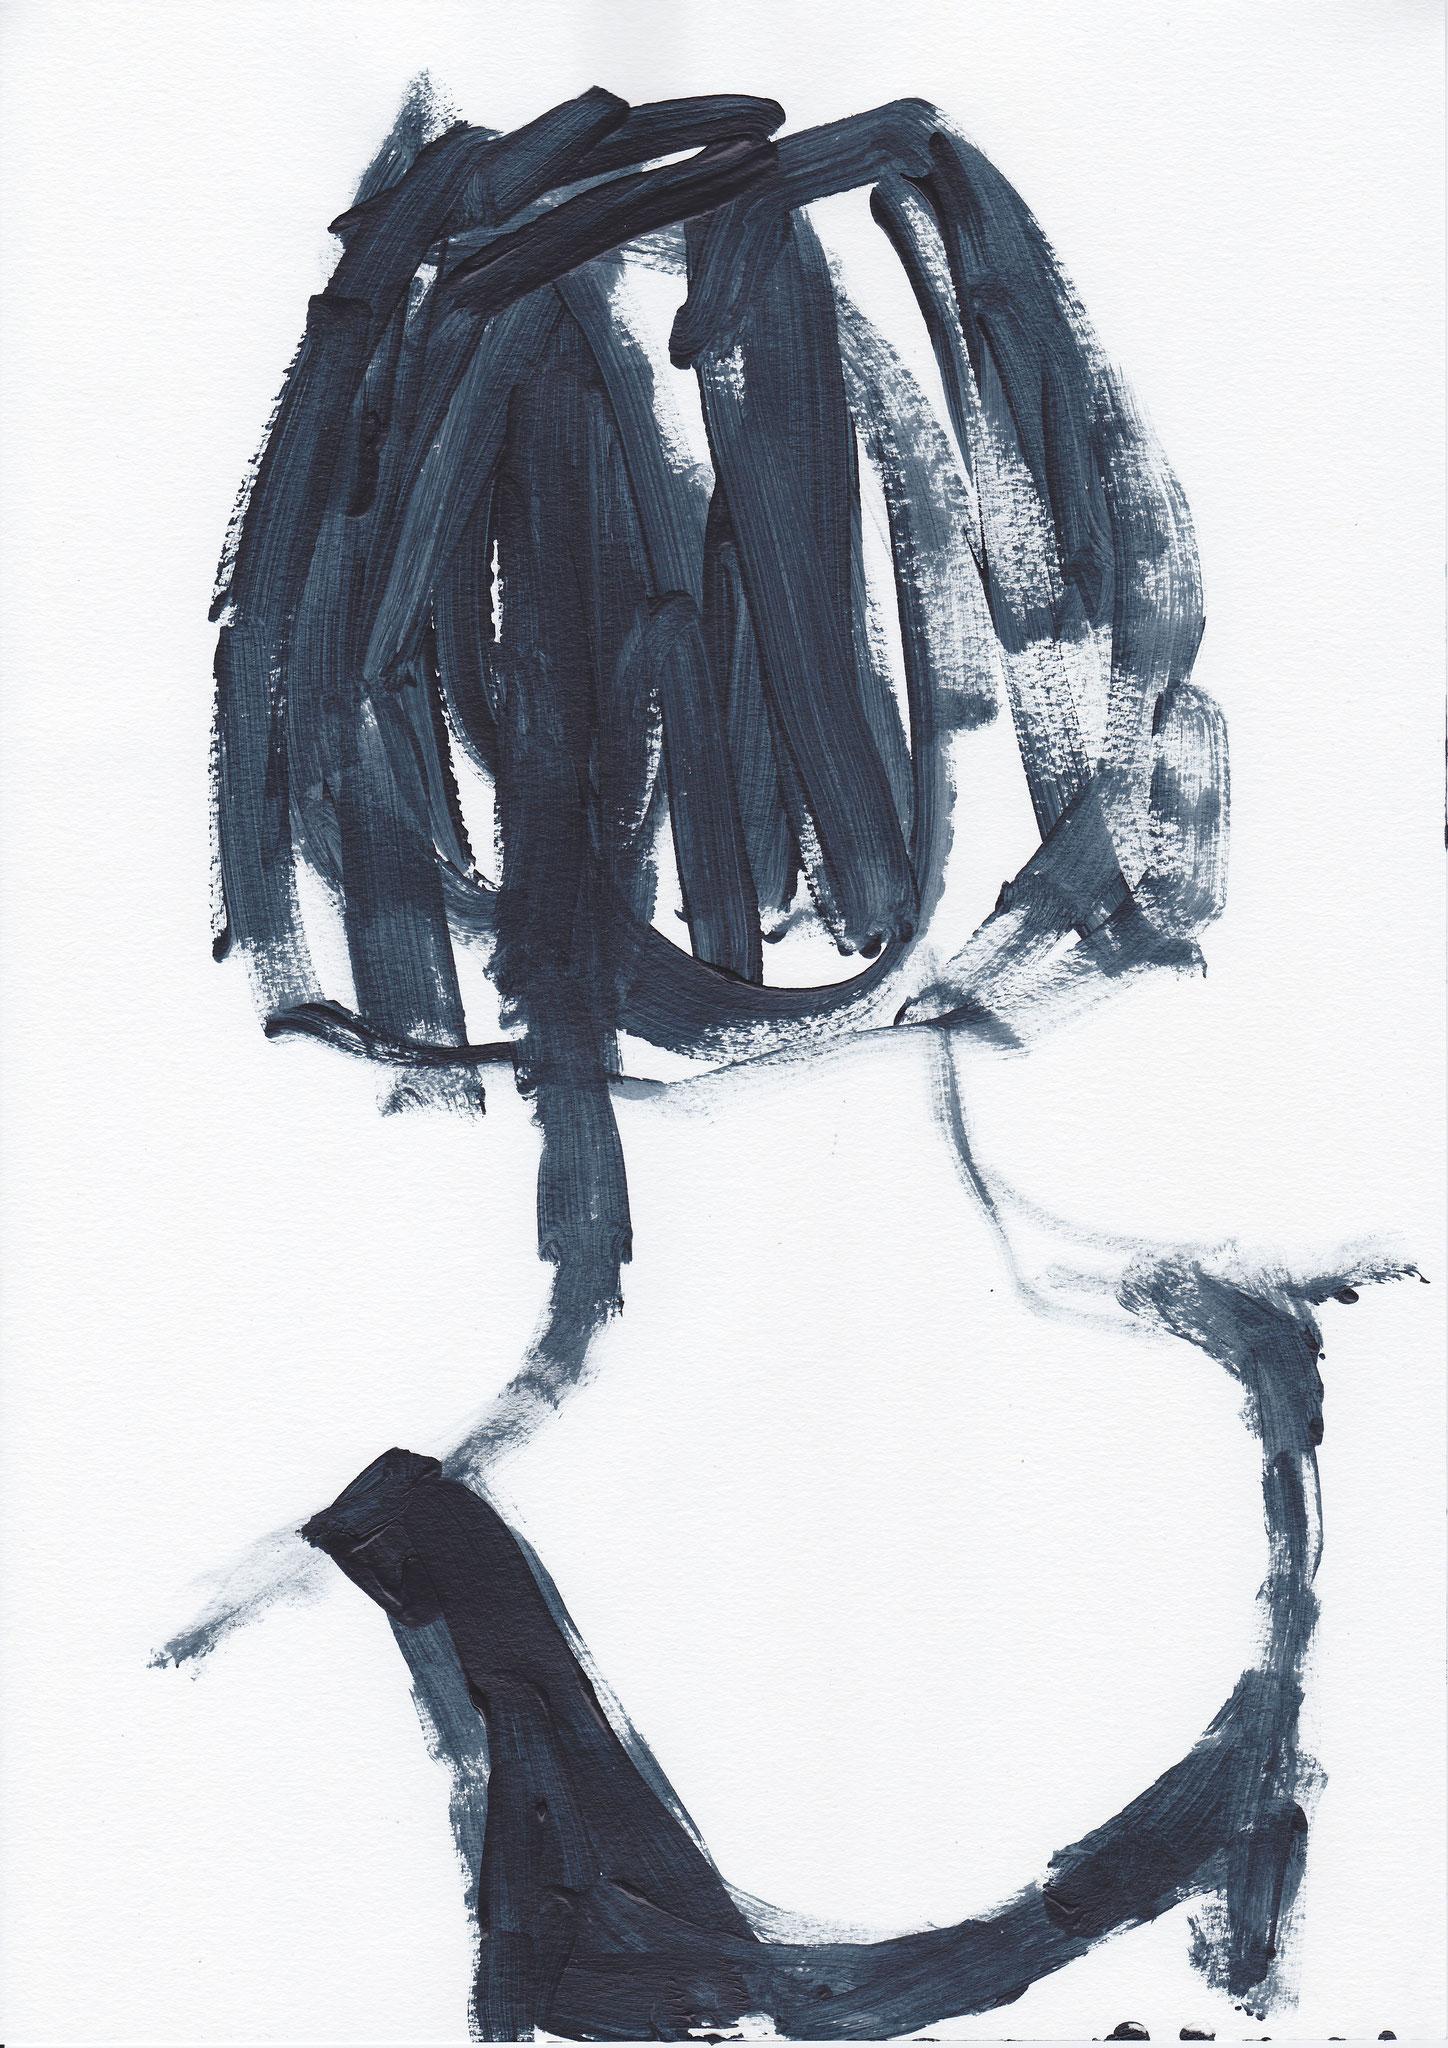 037 , acrylic on paper , 29.7 x 21cm , Selina Saranova